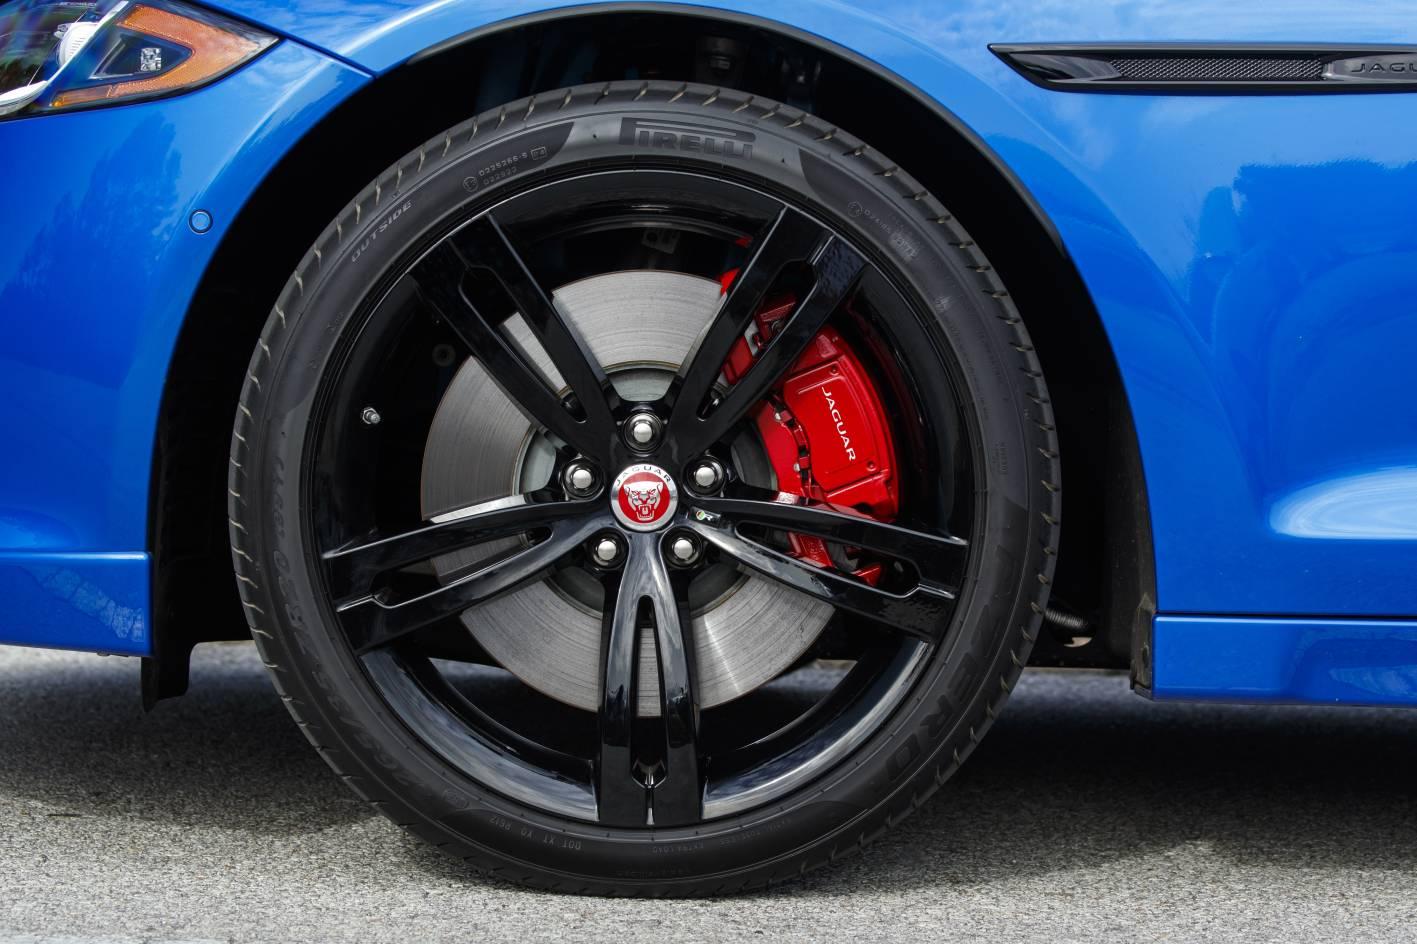 http://www.forcegt.com/wp-content/uploads/2017/10/2018-jaguar-xjr575-20-inch-wheel.jpg